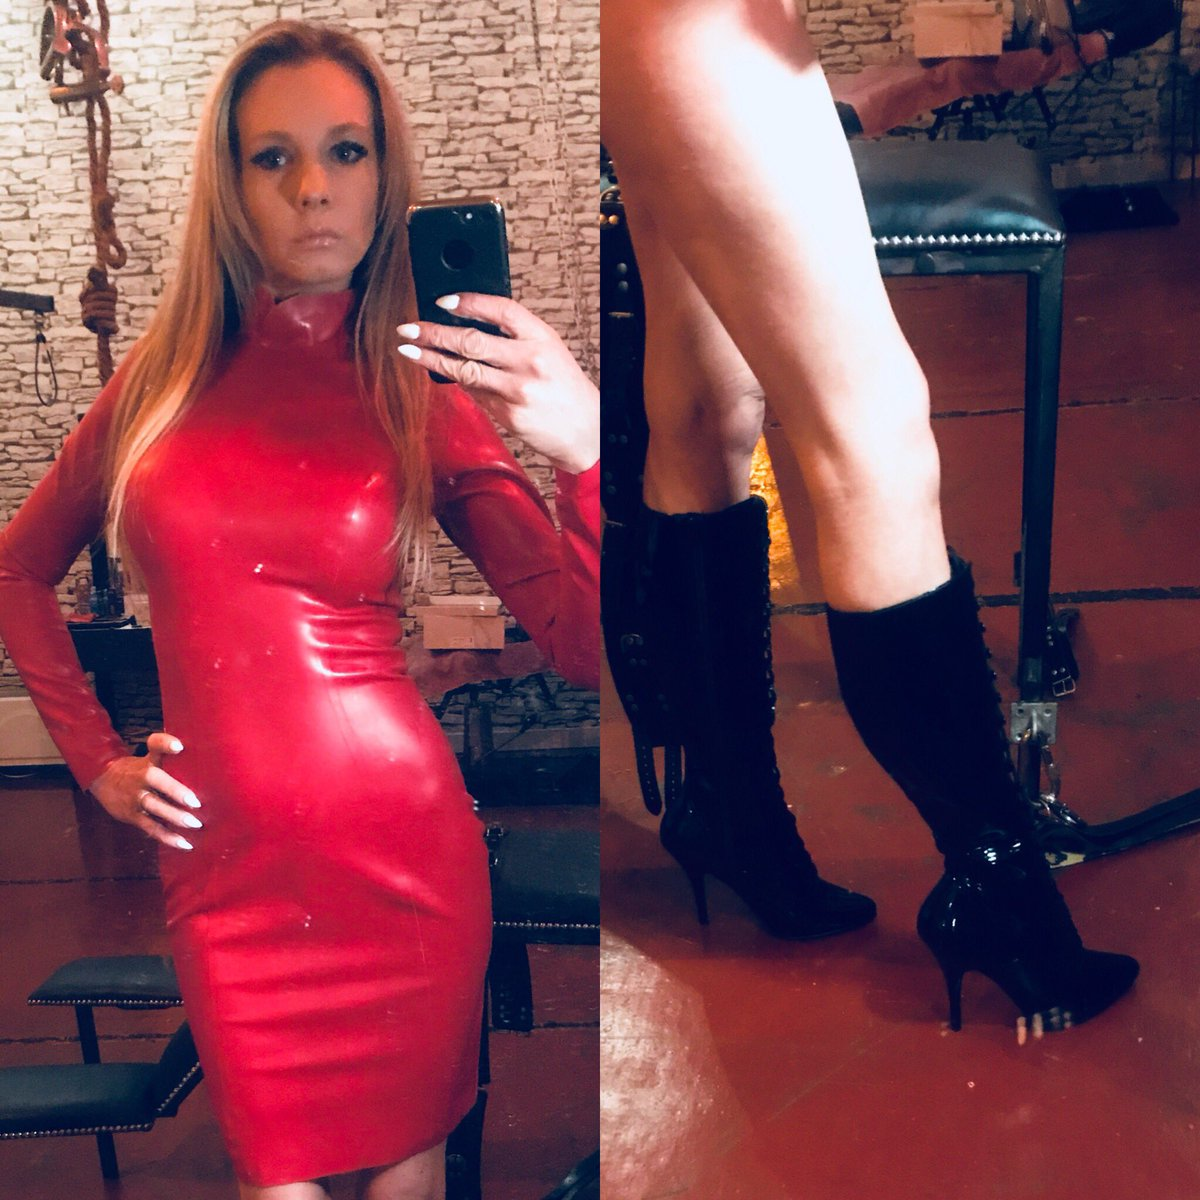 boots femdom Dress